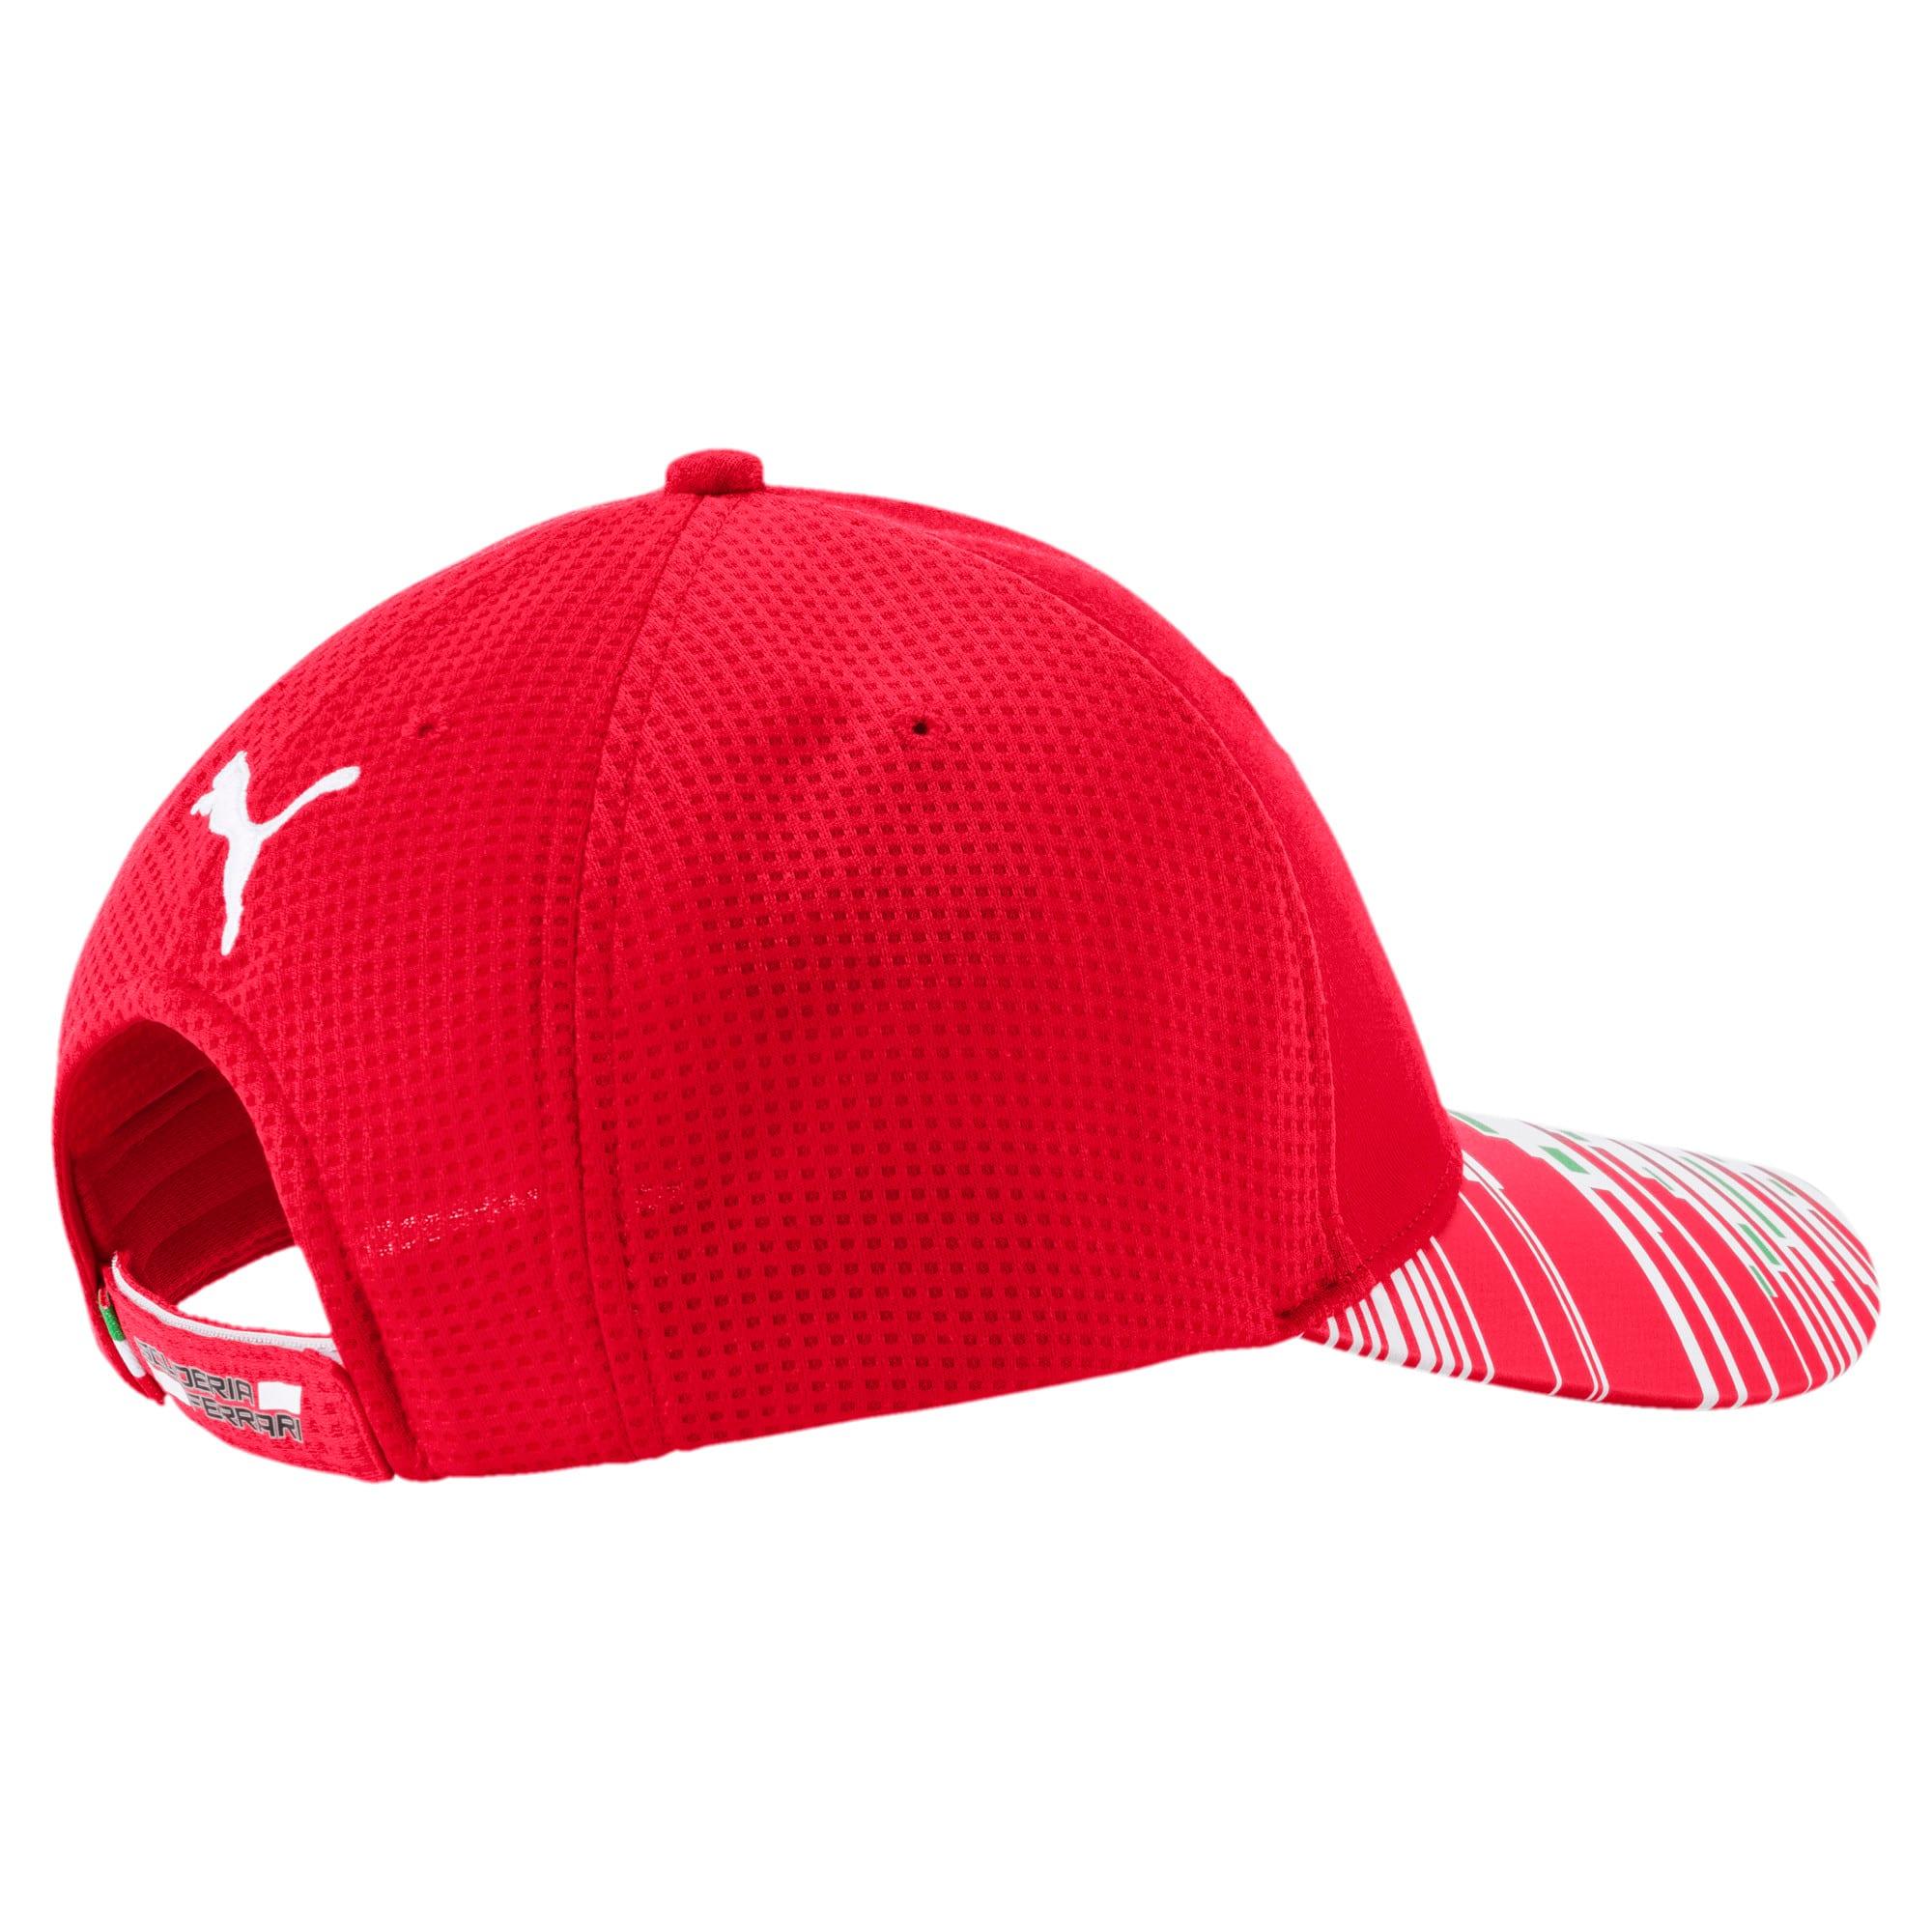 Thumbnail 2 of Scuderia Ferrari Replica Team Hat JR, rosso corsa, medium